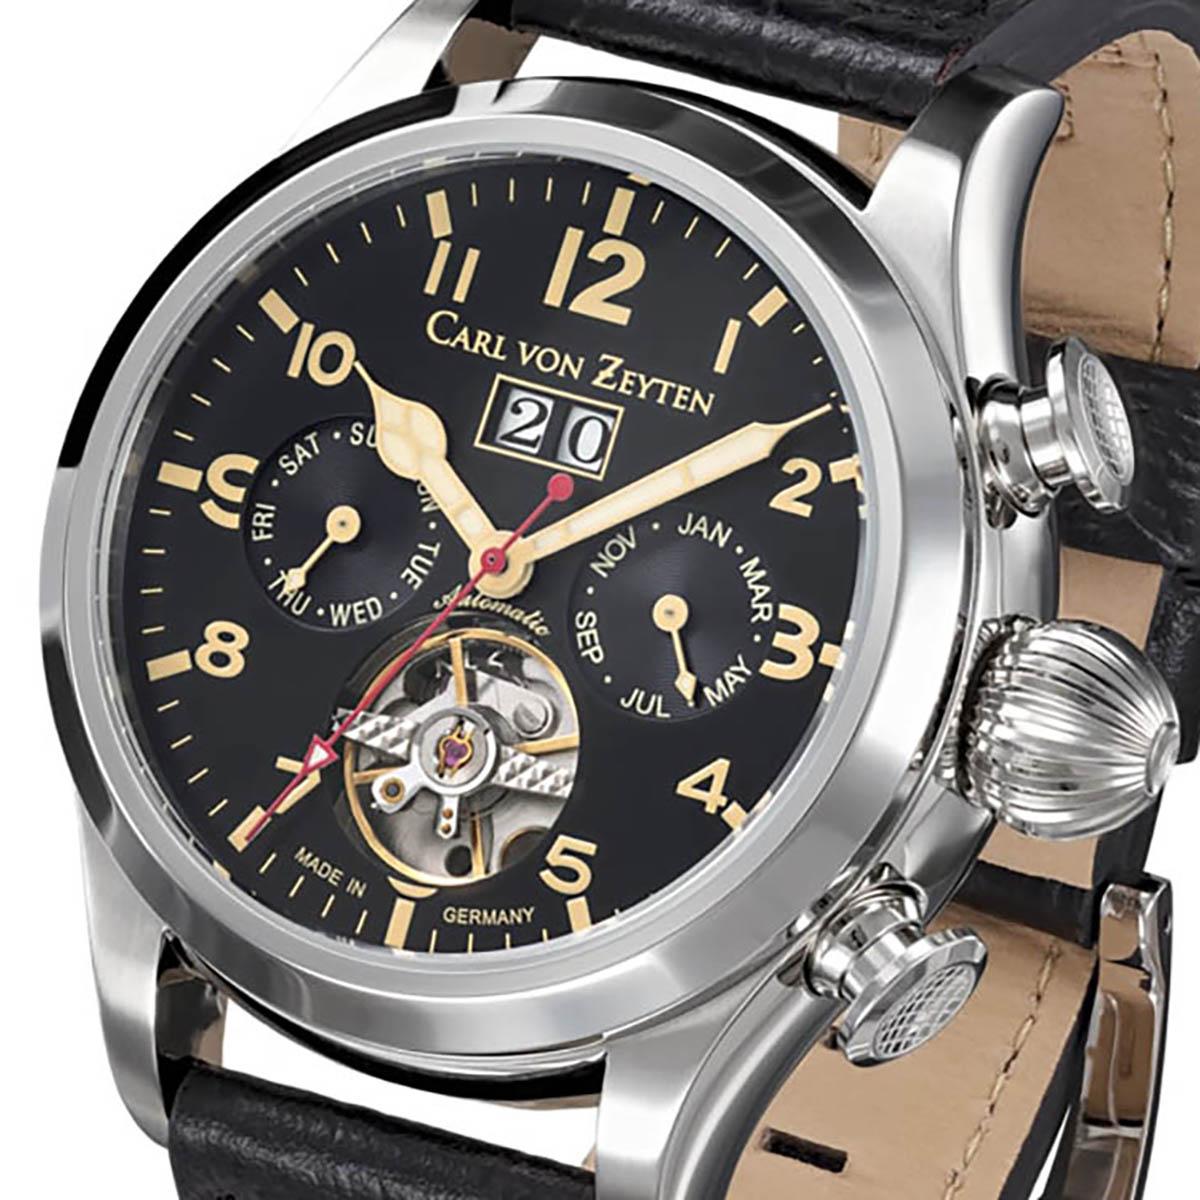 Carl von Zeyten カール・フォン・ツォイテン 自動巻き(手巻き機能あり) 腕時計 [CvZ0025BK] 正規品  カレンダー スケルトン